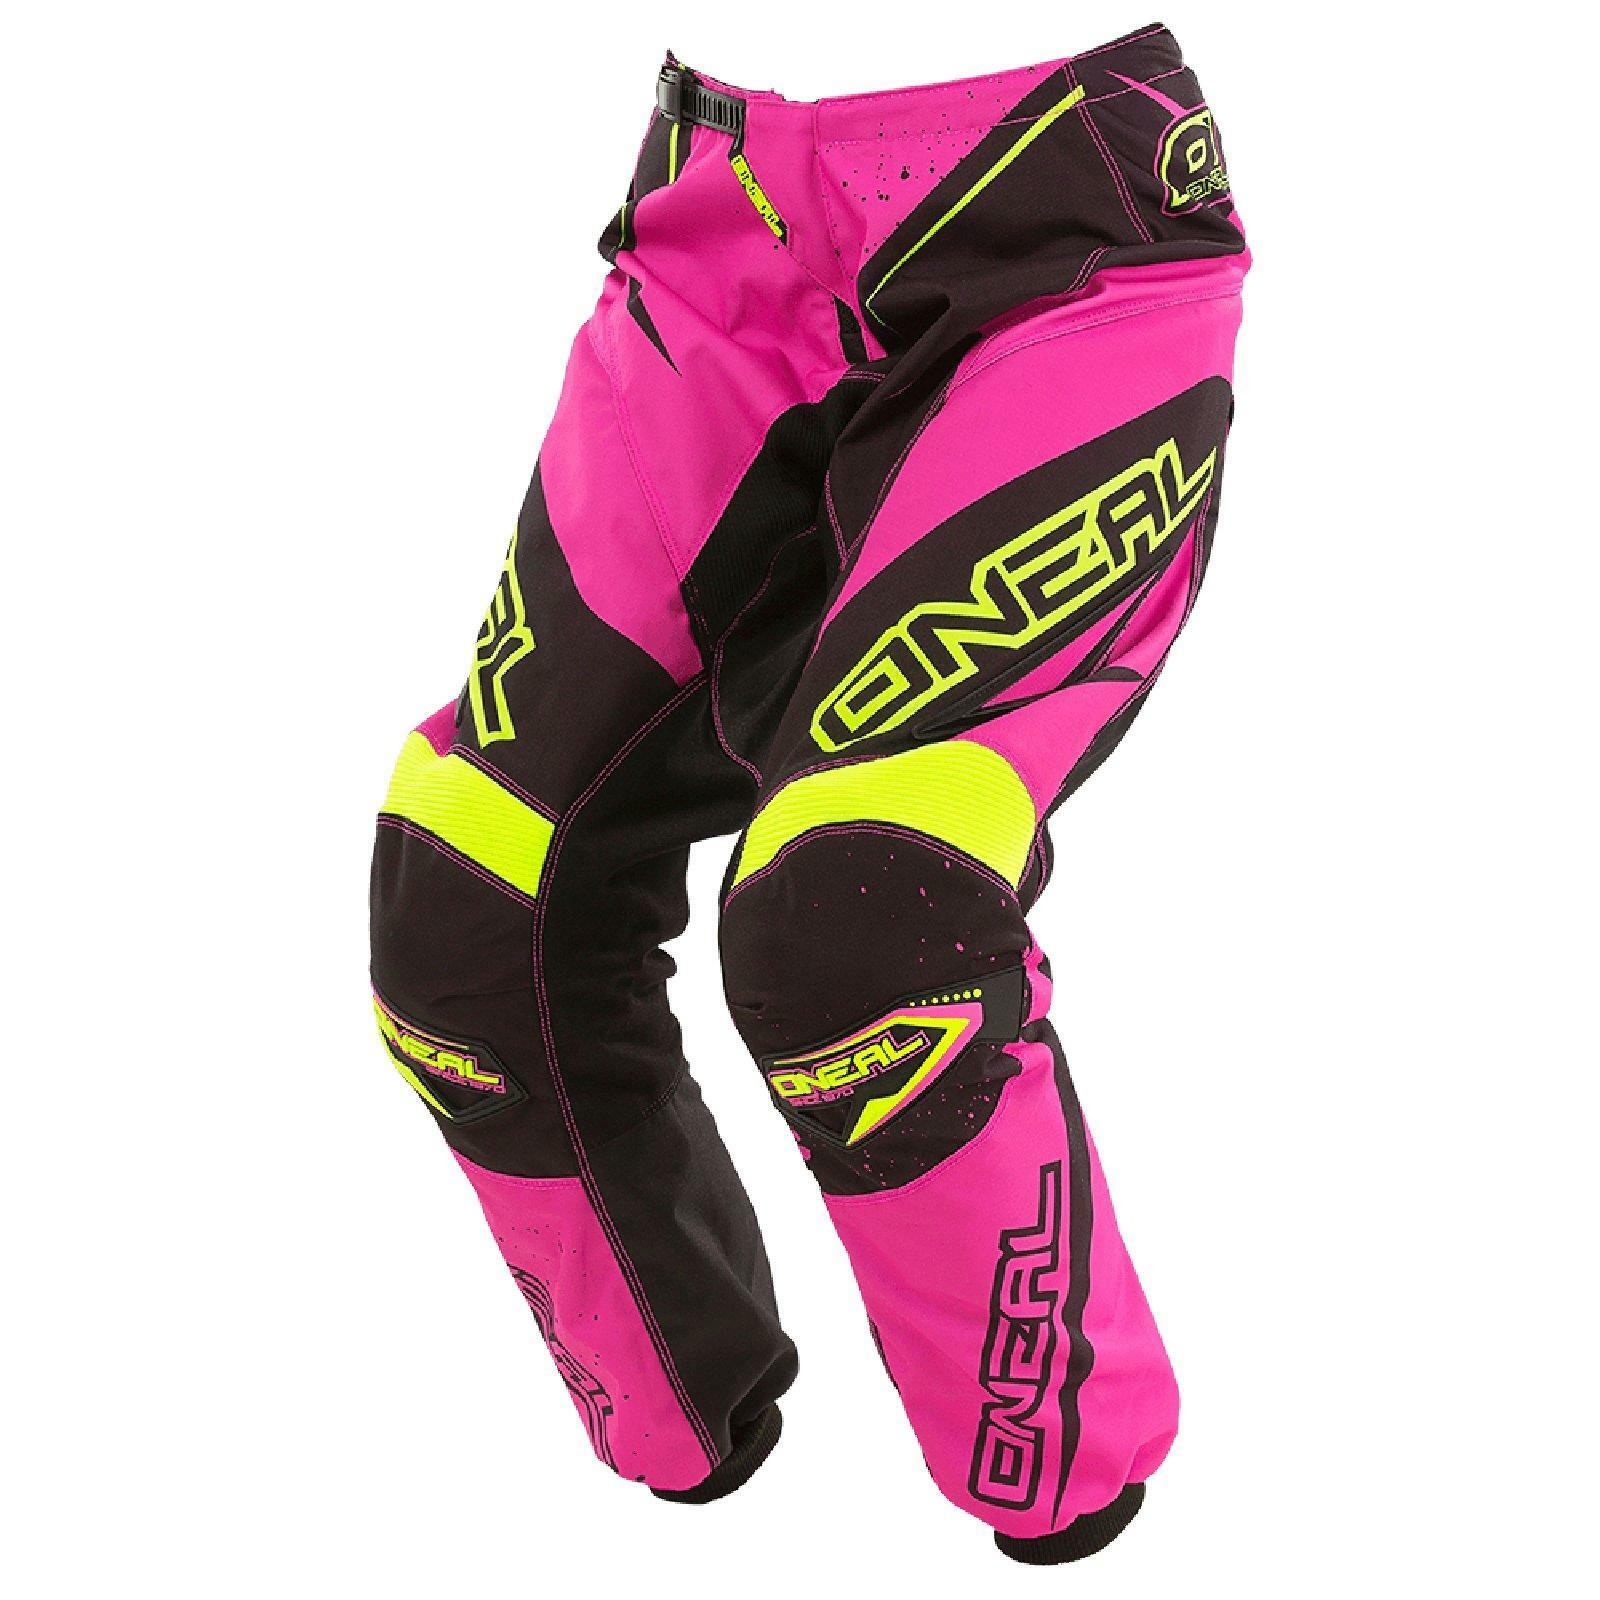 ONeal Element MX DAMEN Hose Racewear Damens Rosa Moto Cross Enduro Mountainbike